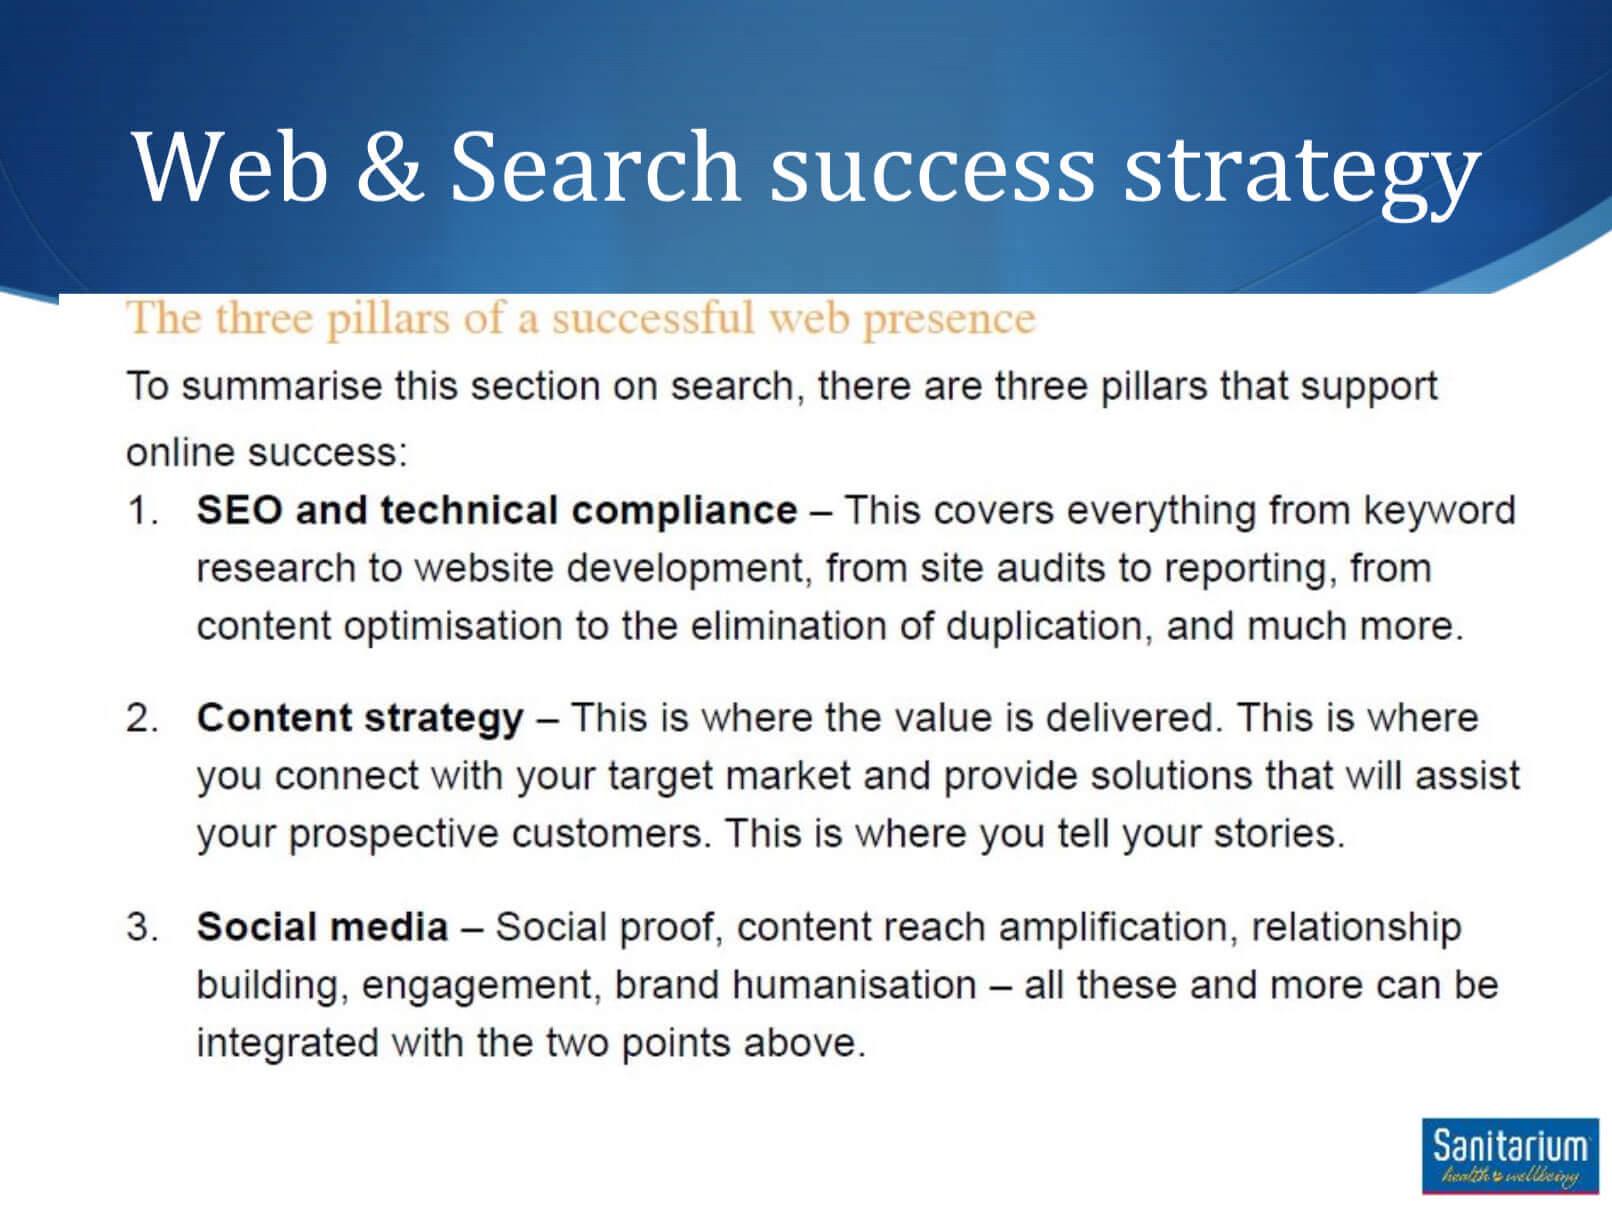 Web & Search Success Strategy